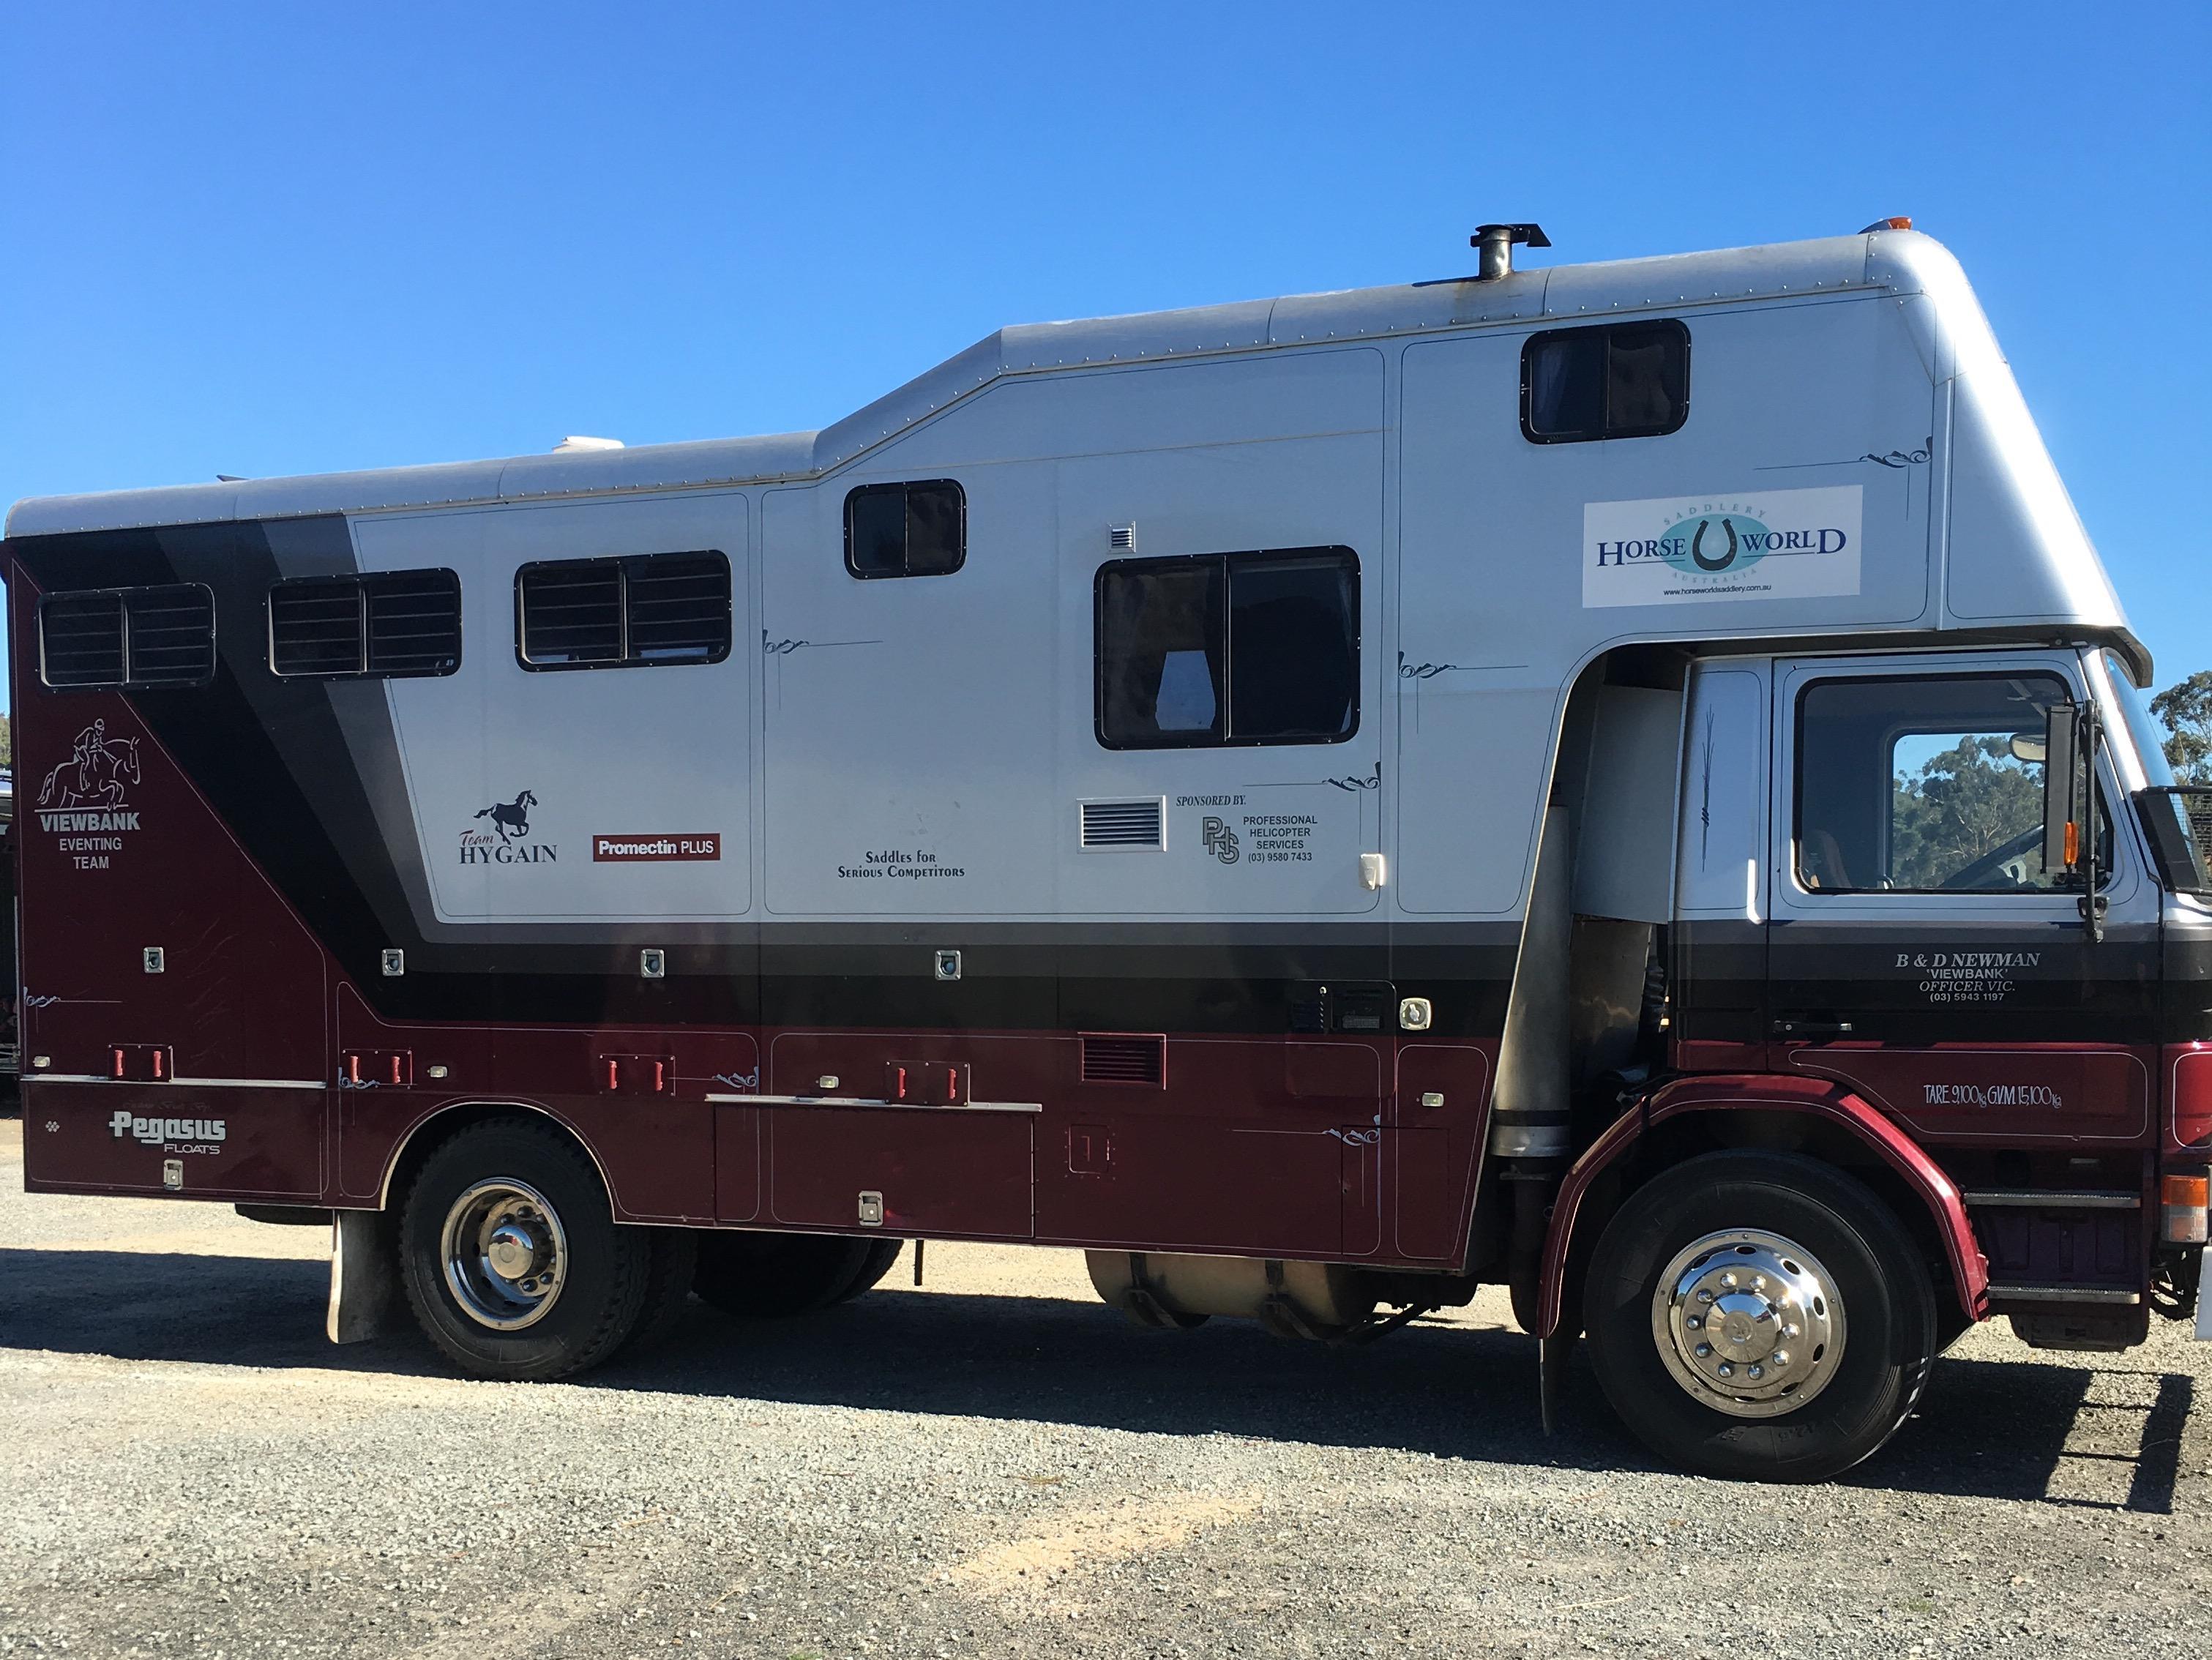 Scania 4 horse truck